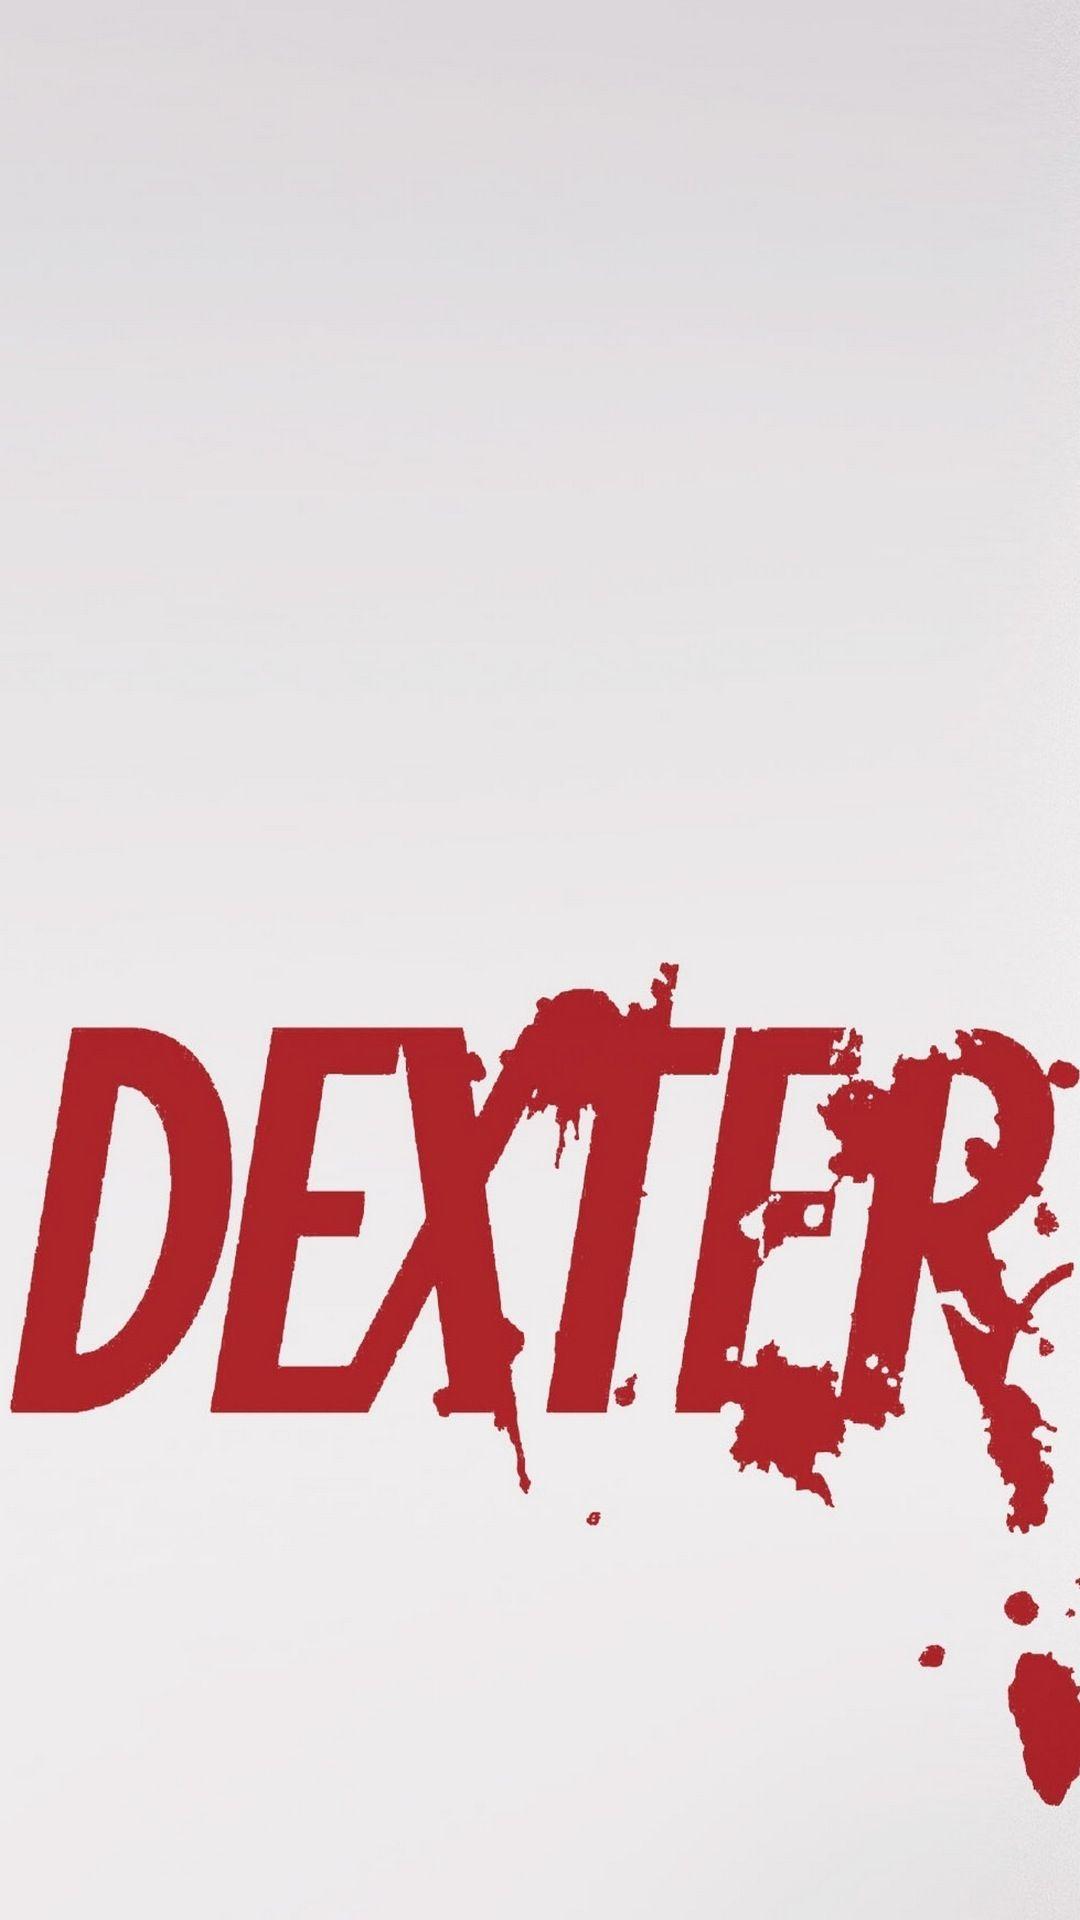 Marvelous Dexter Series Logo #iPhone #6 #plus #wallpaper